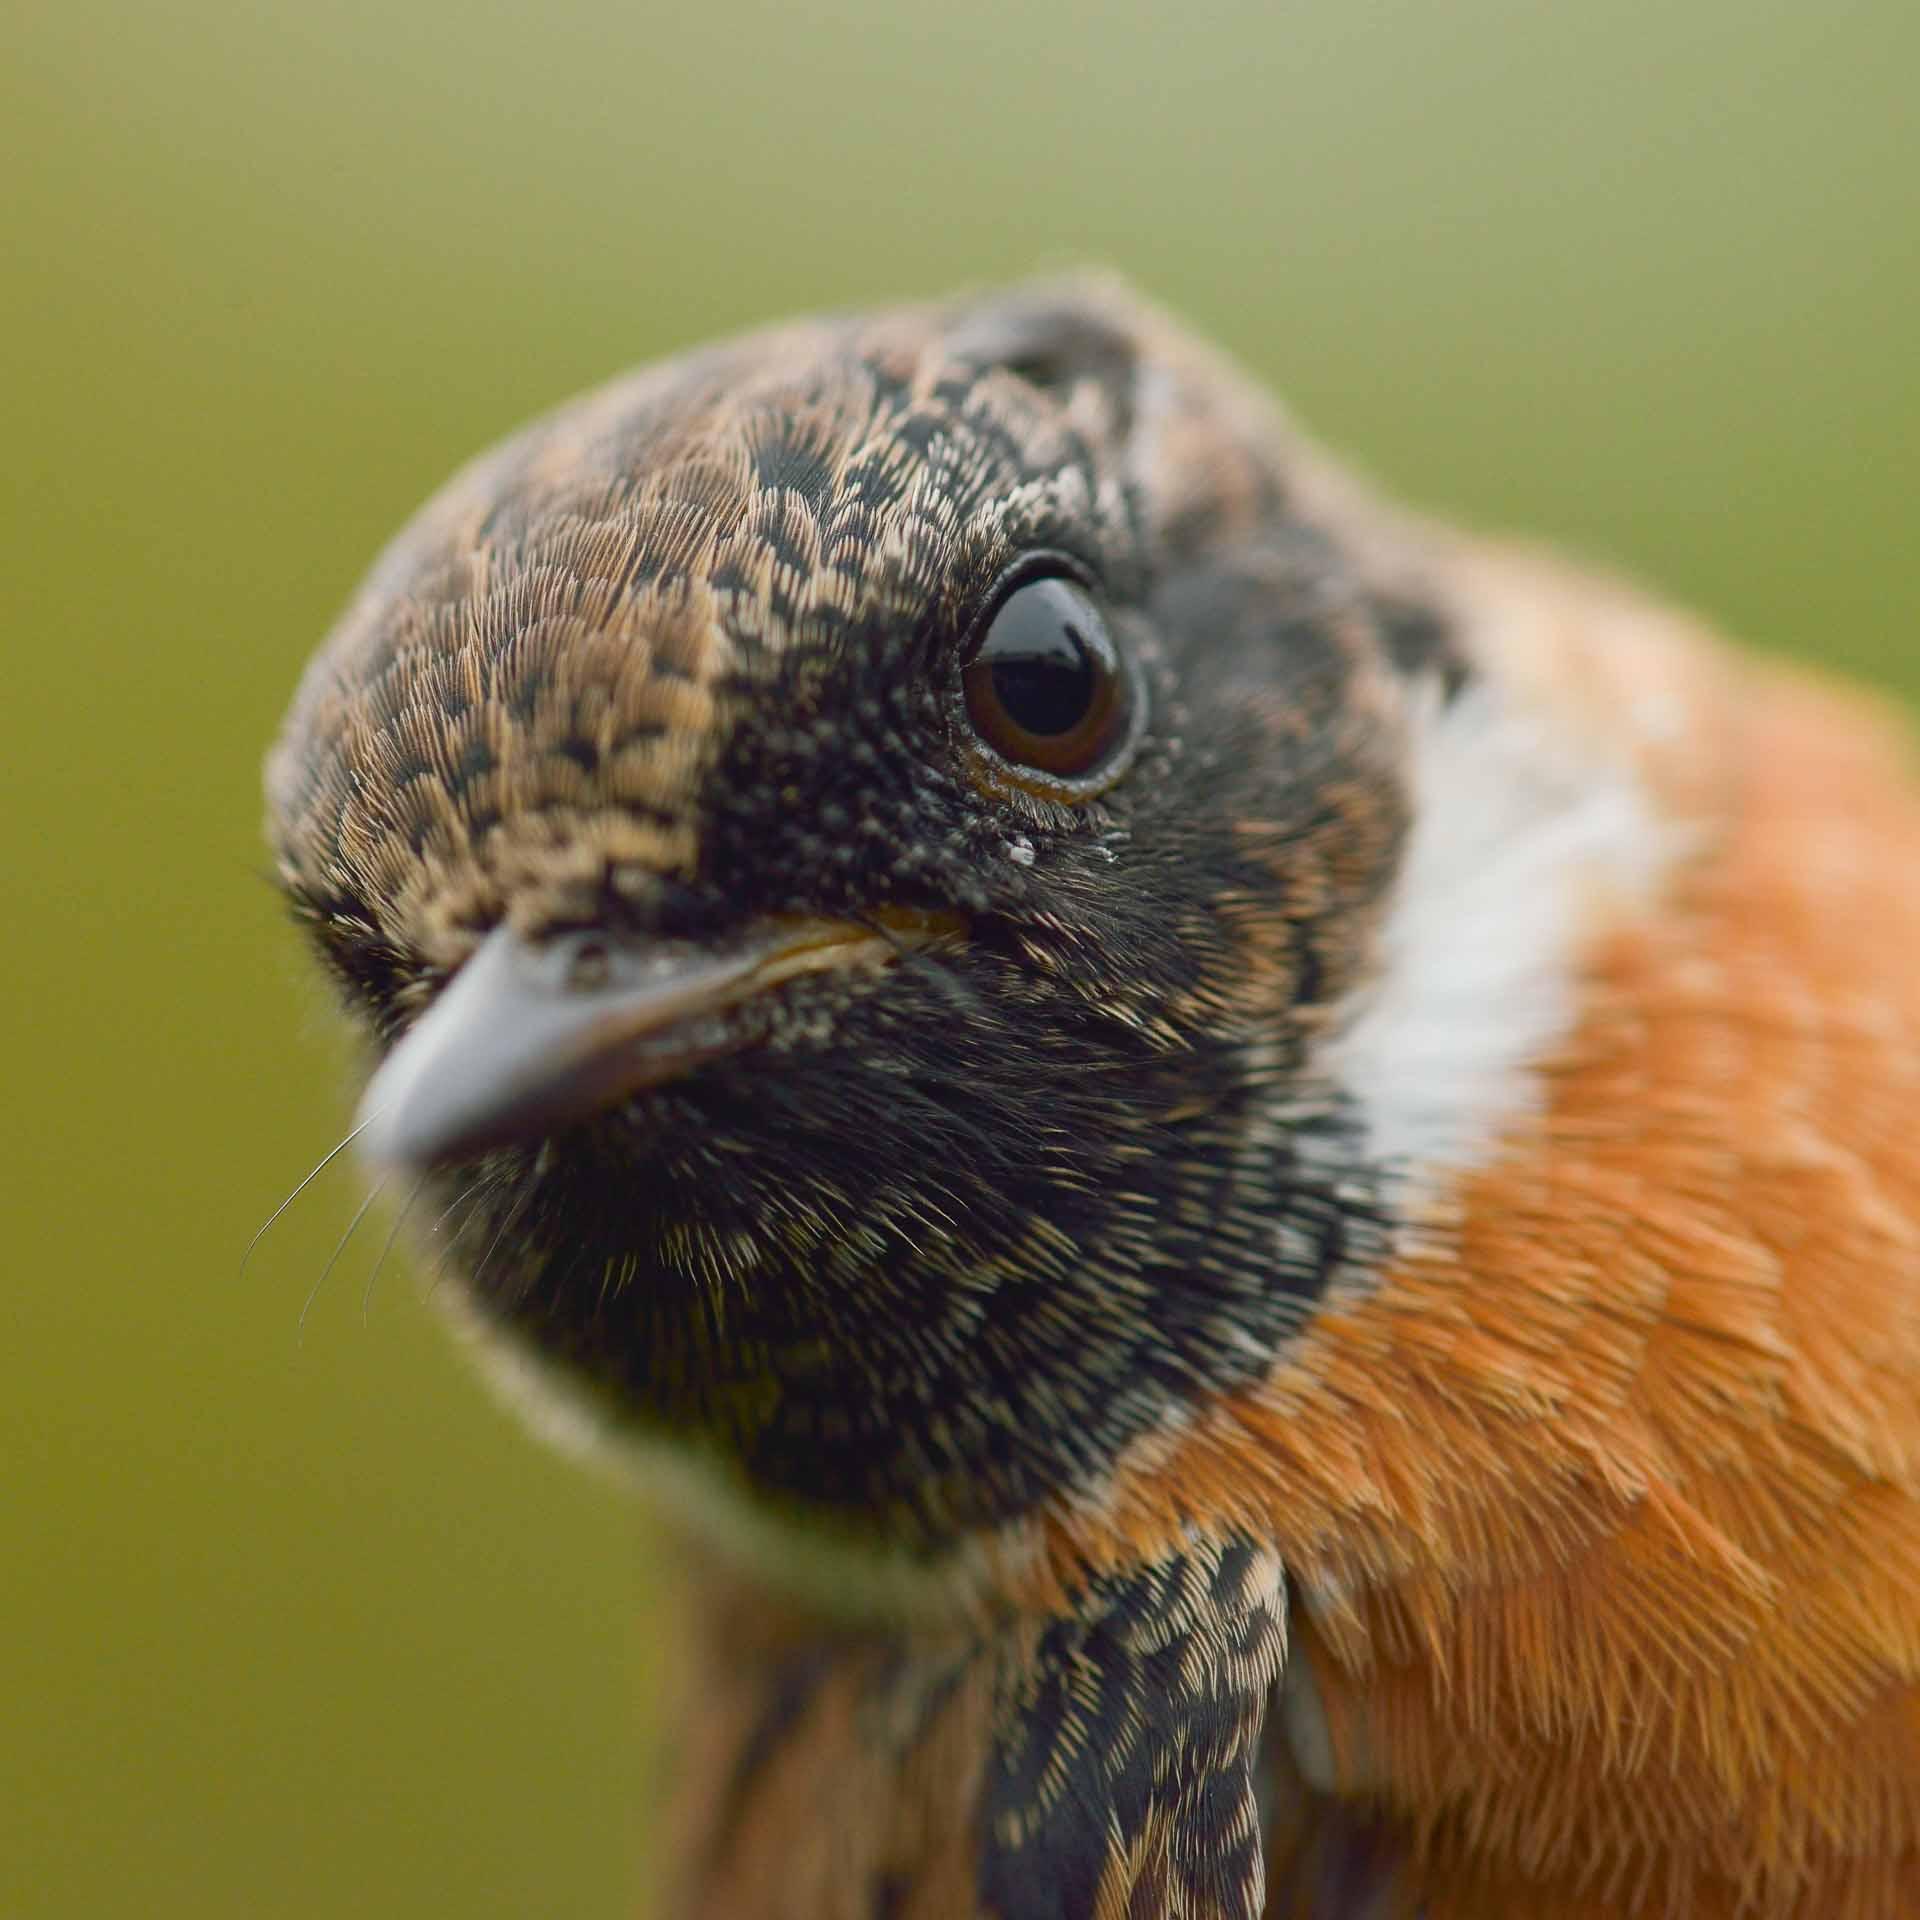 fotoreis fotoworkshop natuurfotografie schiermonnikoog vogelfotografie landschapsfotografie lapwing travels